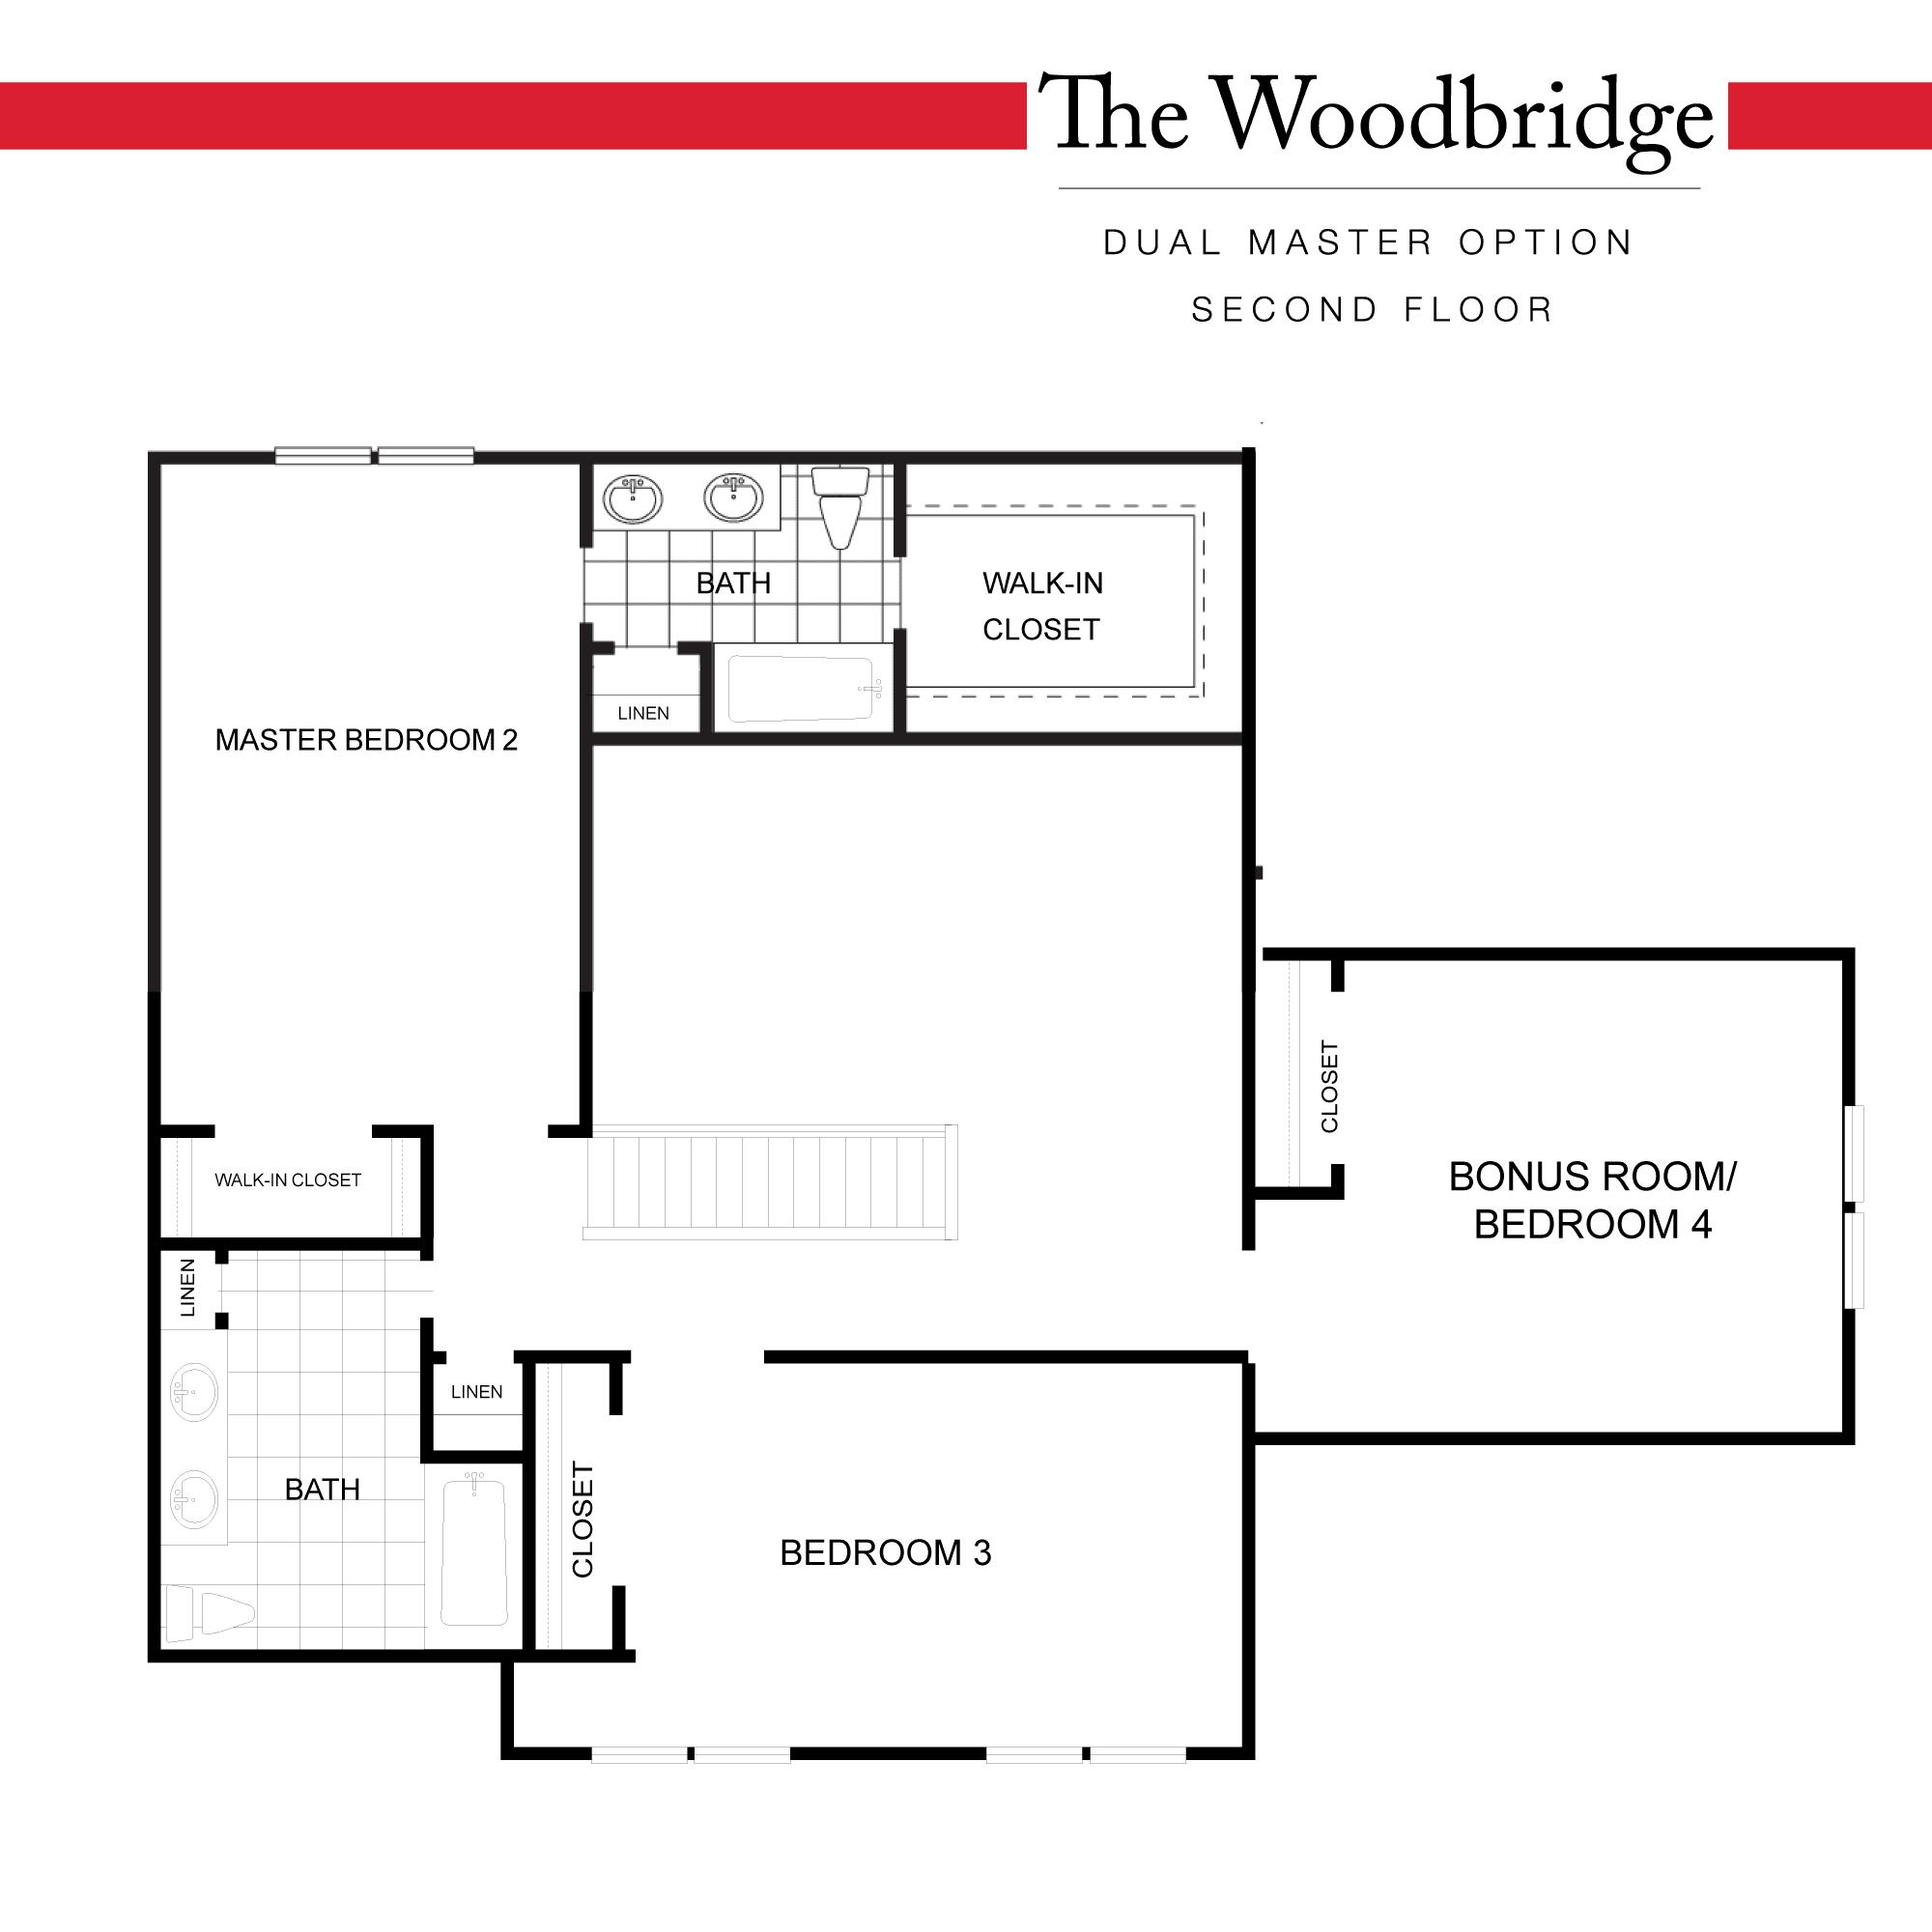 Dual Master Plan - Second Floor